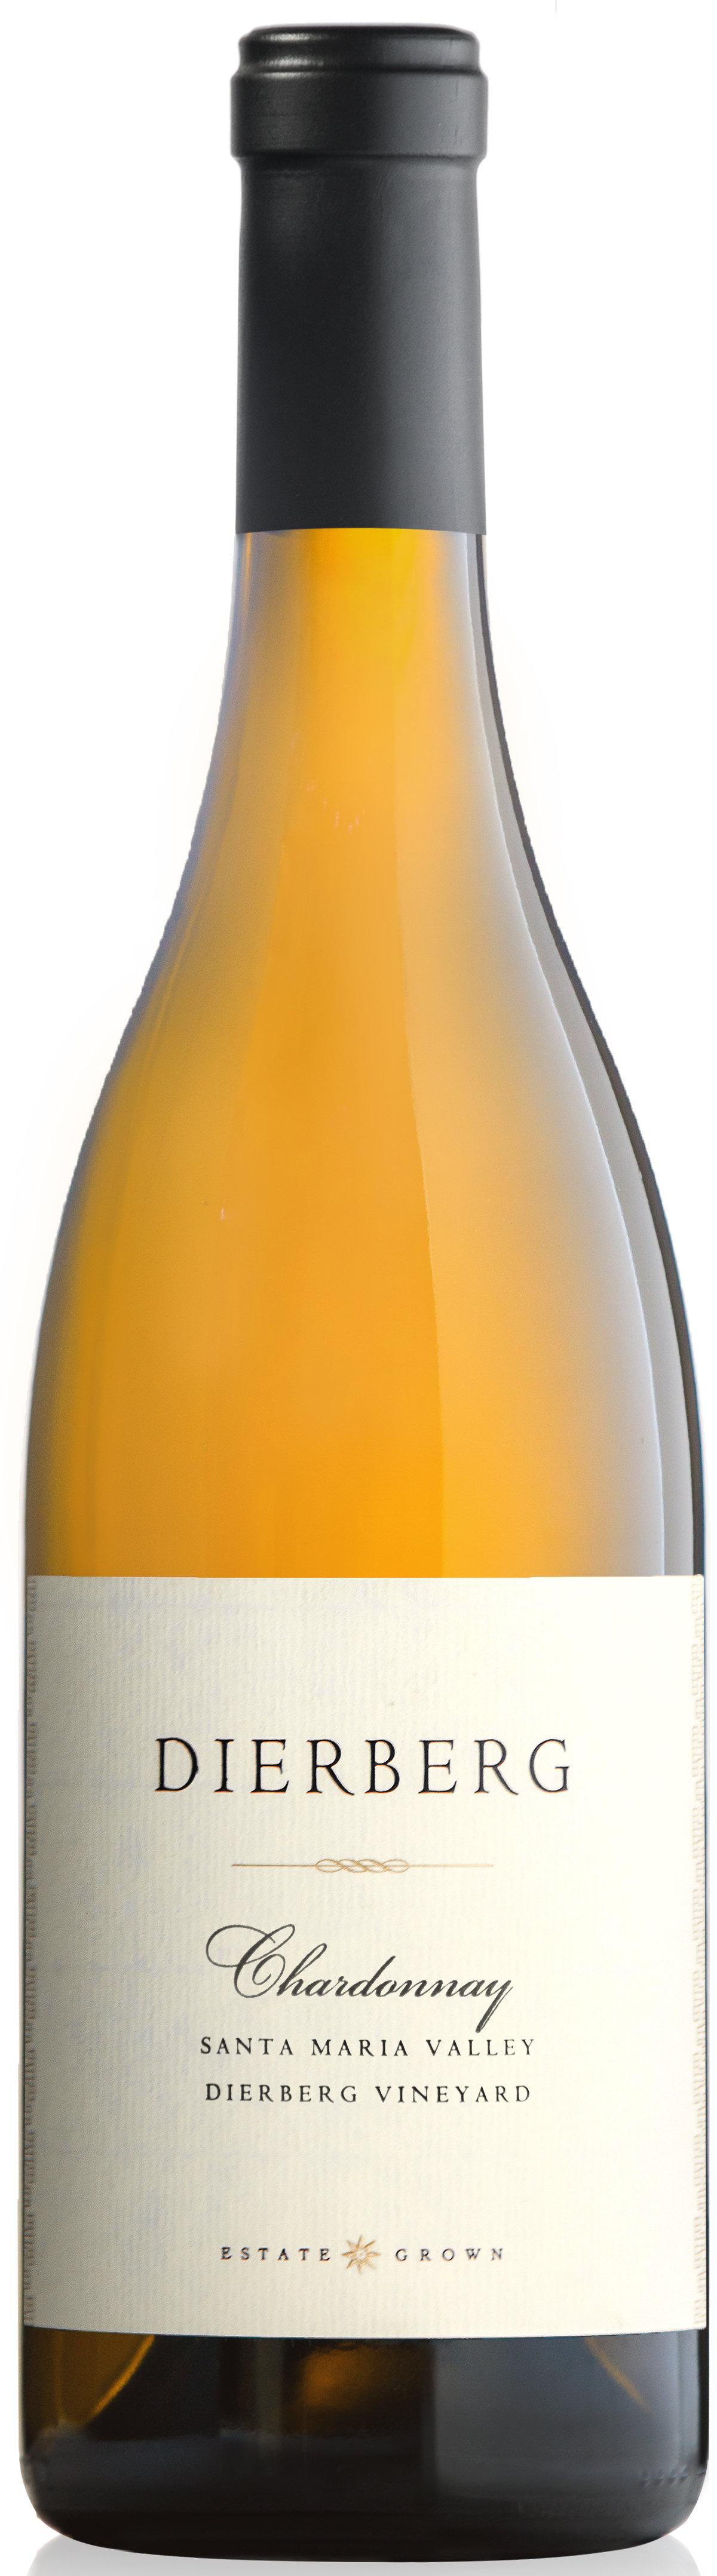 Dierberg - Chardonnay, Santa Maria Valley